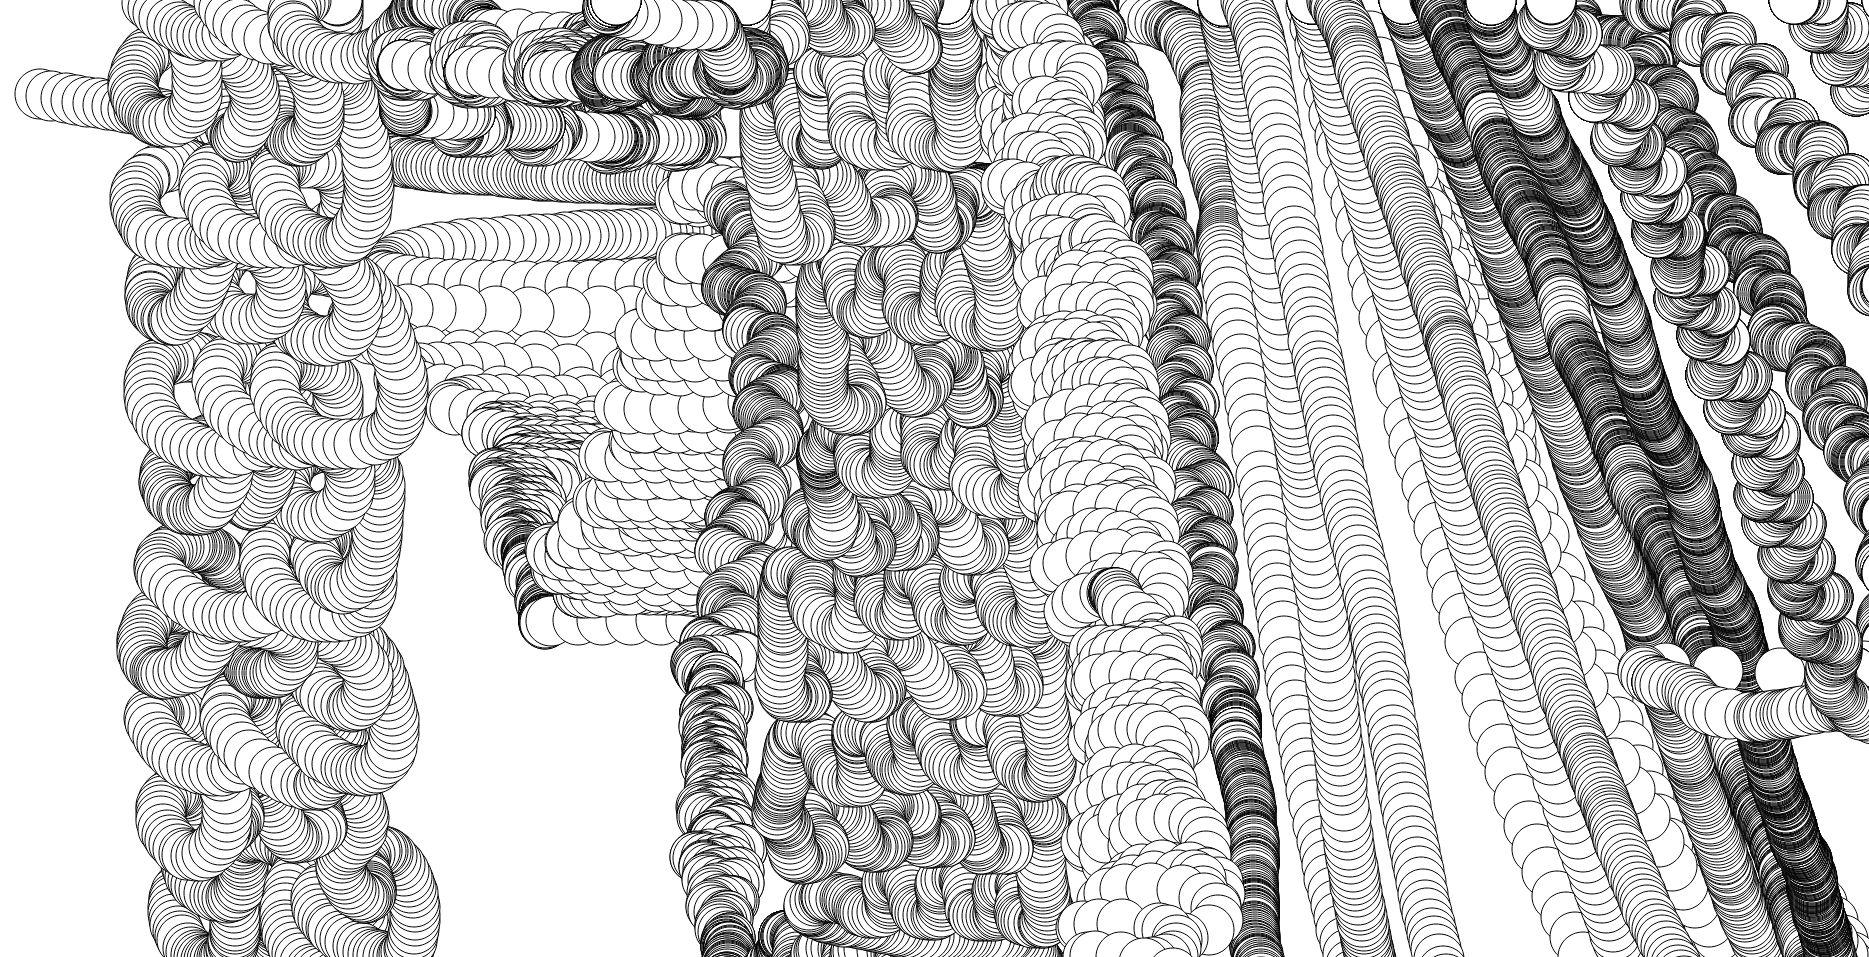 knotted-wool-sketch-pattern-tests-p5js-mafj-alvarez